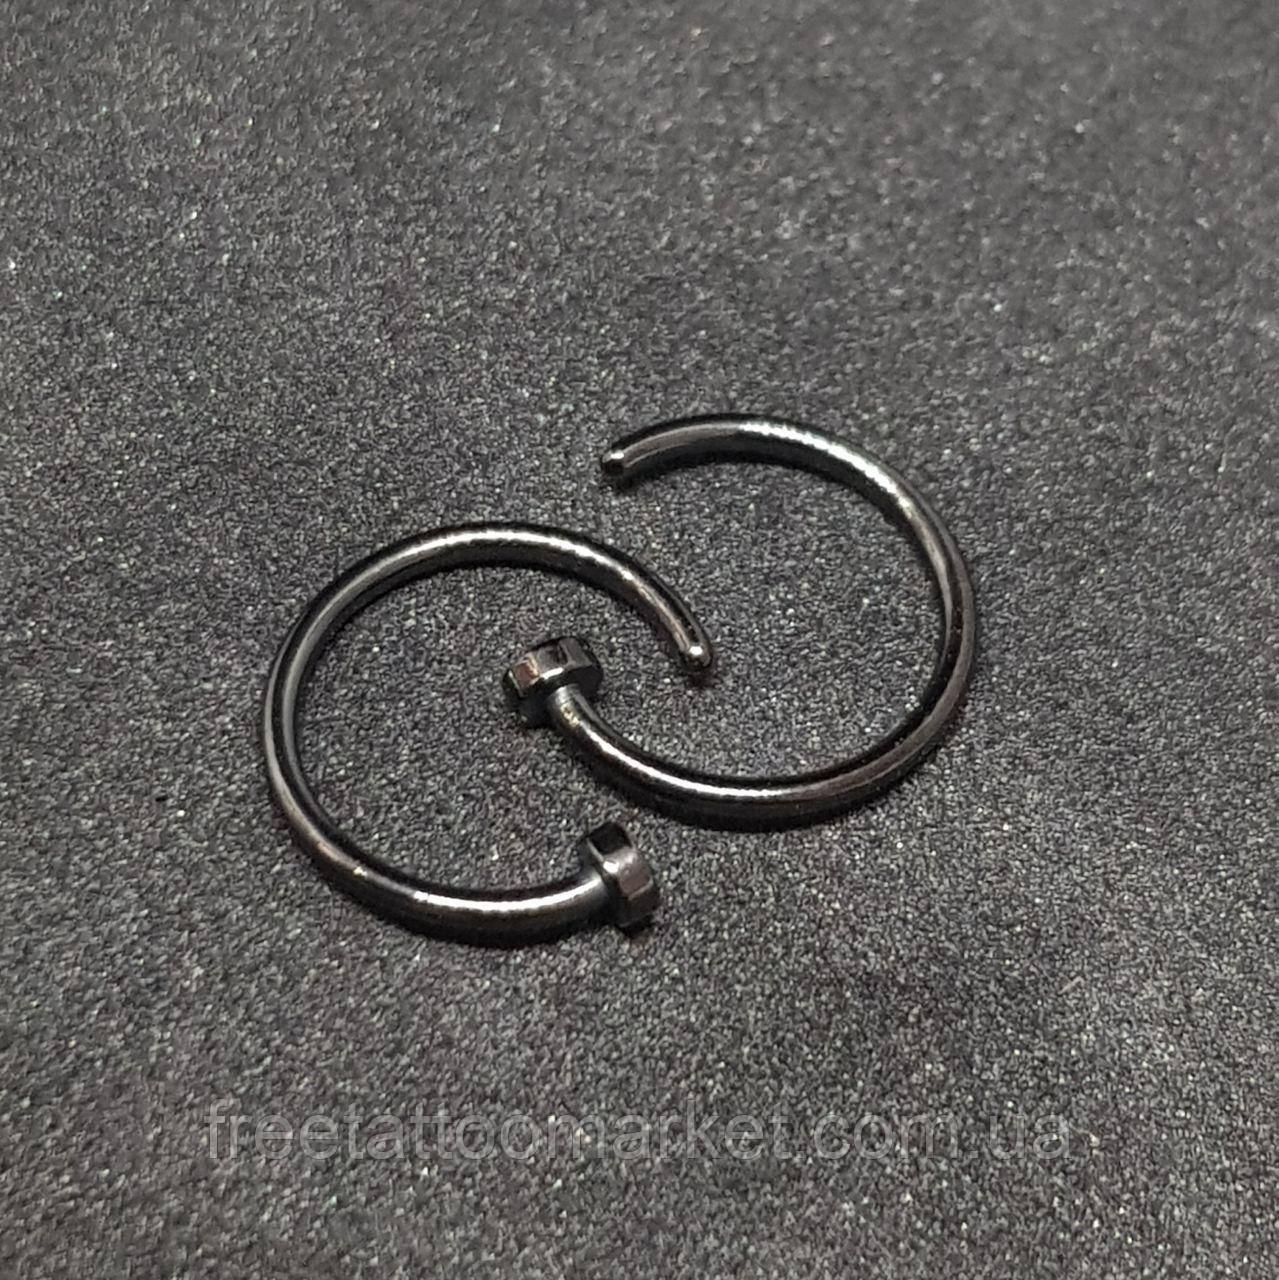 Кольцо для пирсинга носа черное с фиксатором (диаметр 10мм)